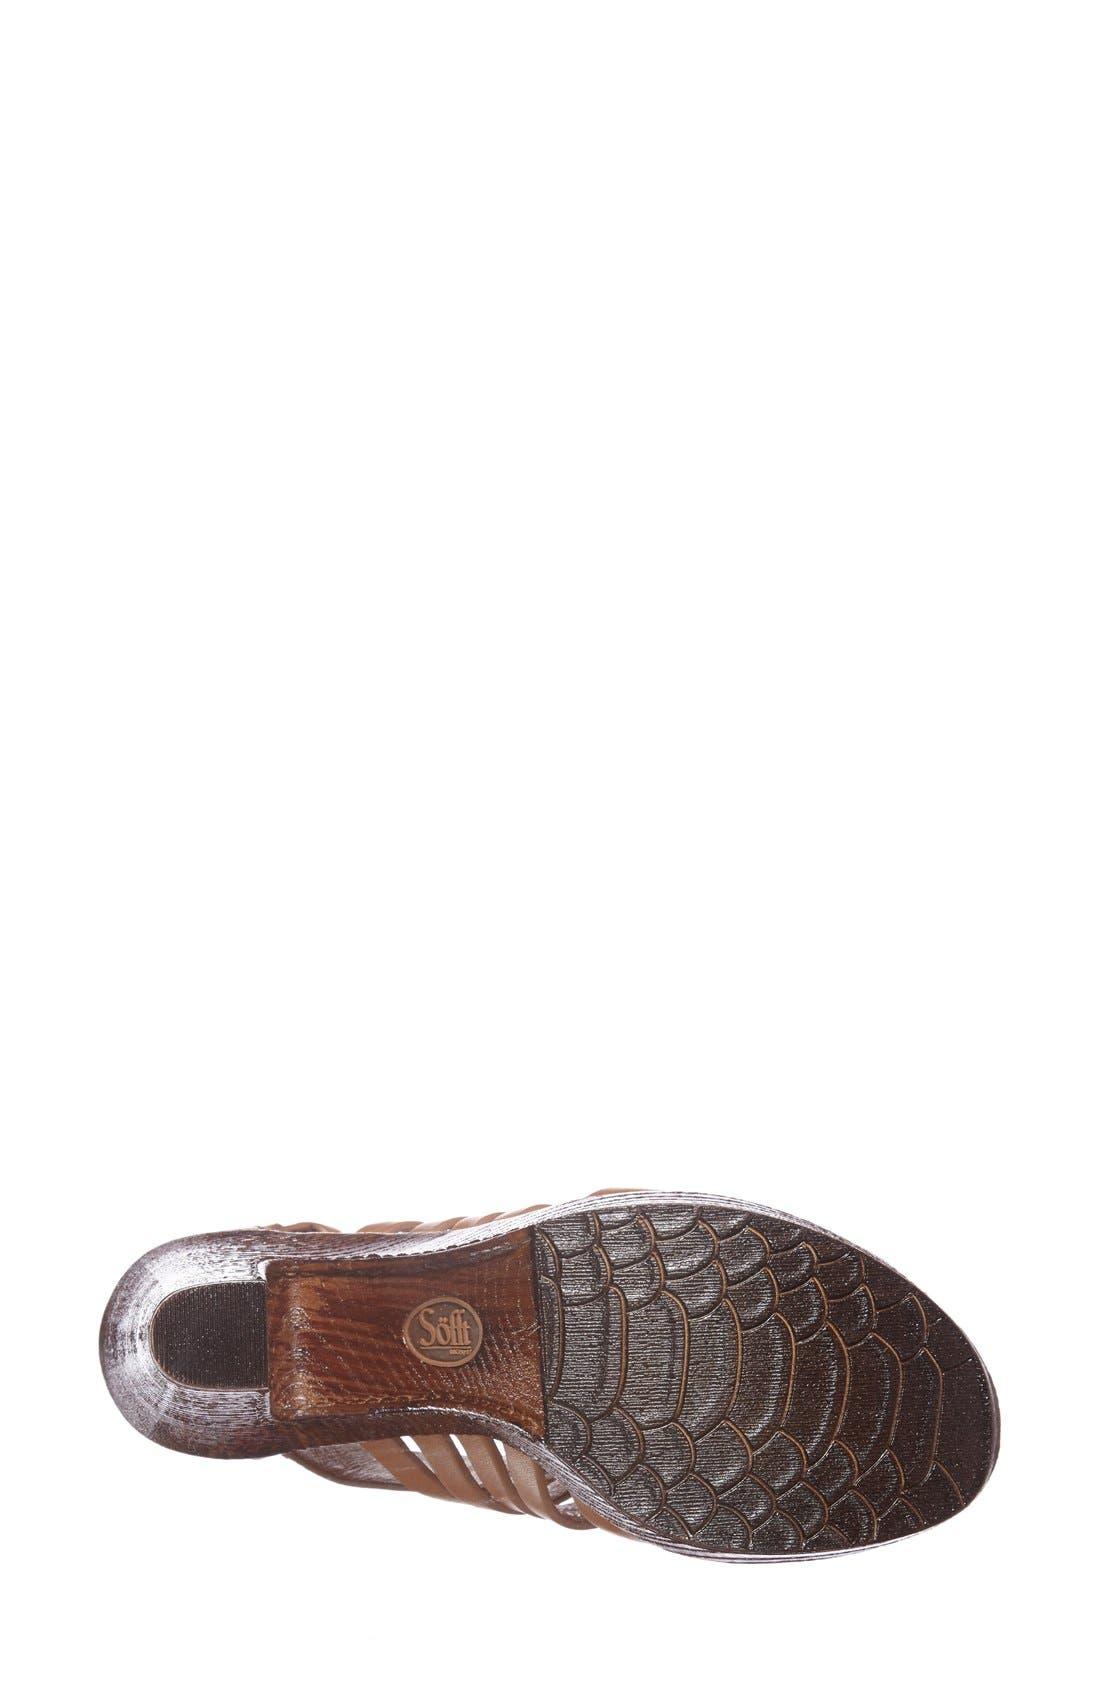 Alternate Image 4  - Söfft 'Ohanna' Leather Sandal (Women)